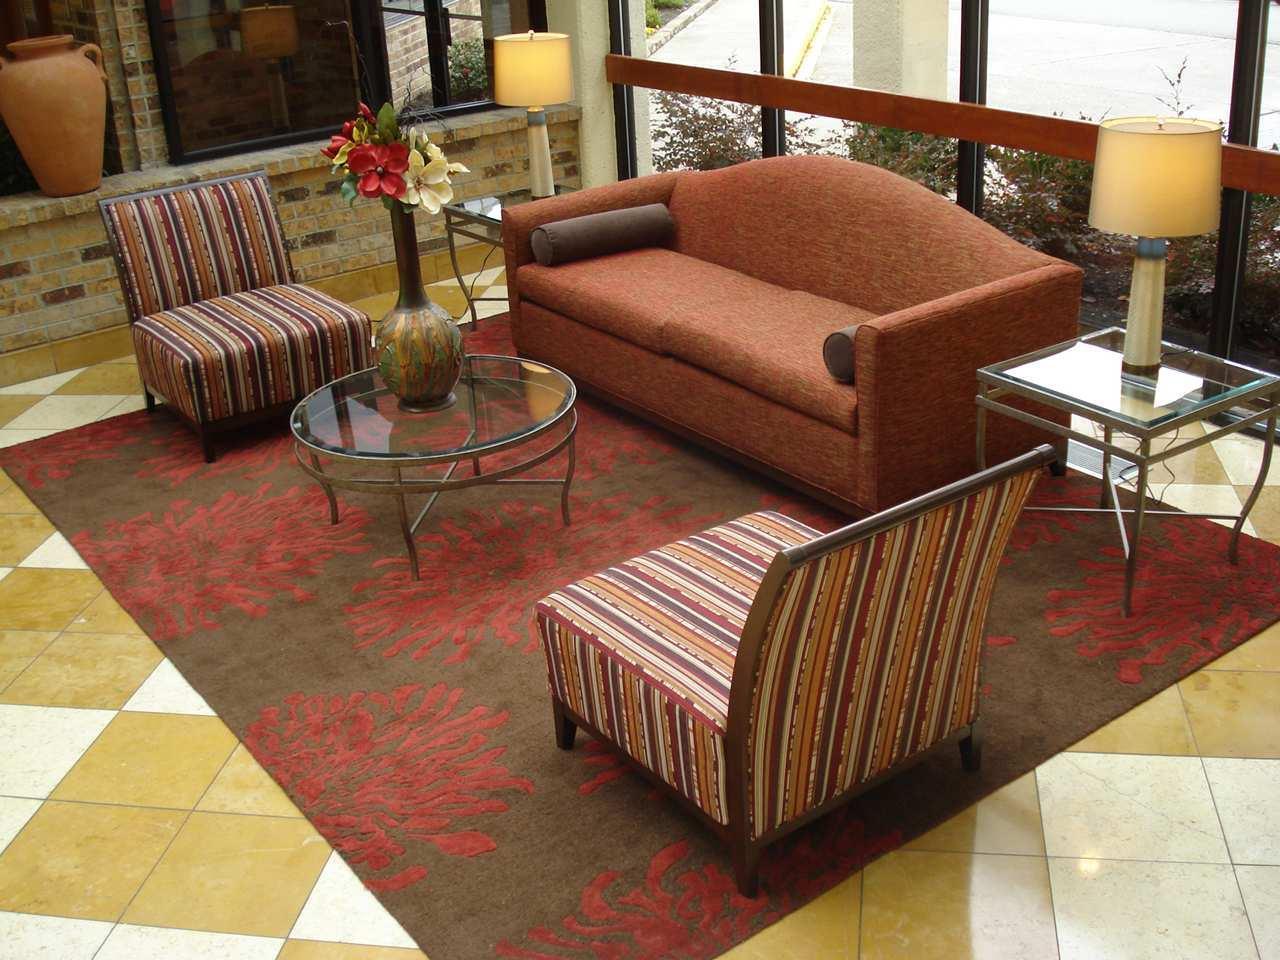 DoubleTree by Hilton Hotel Oak Ridge - Knoxville image 1